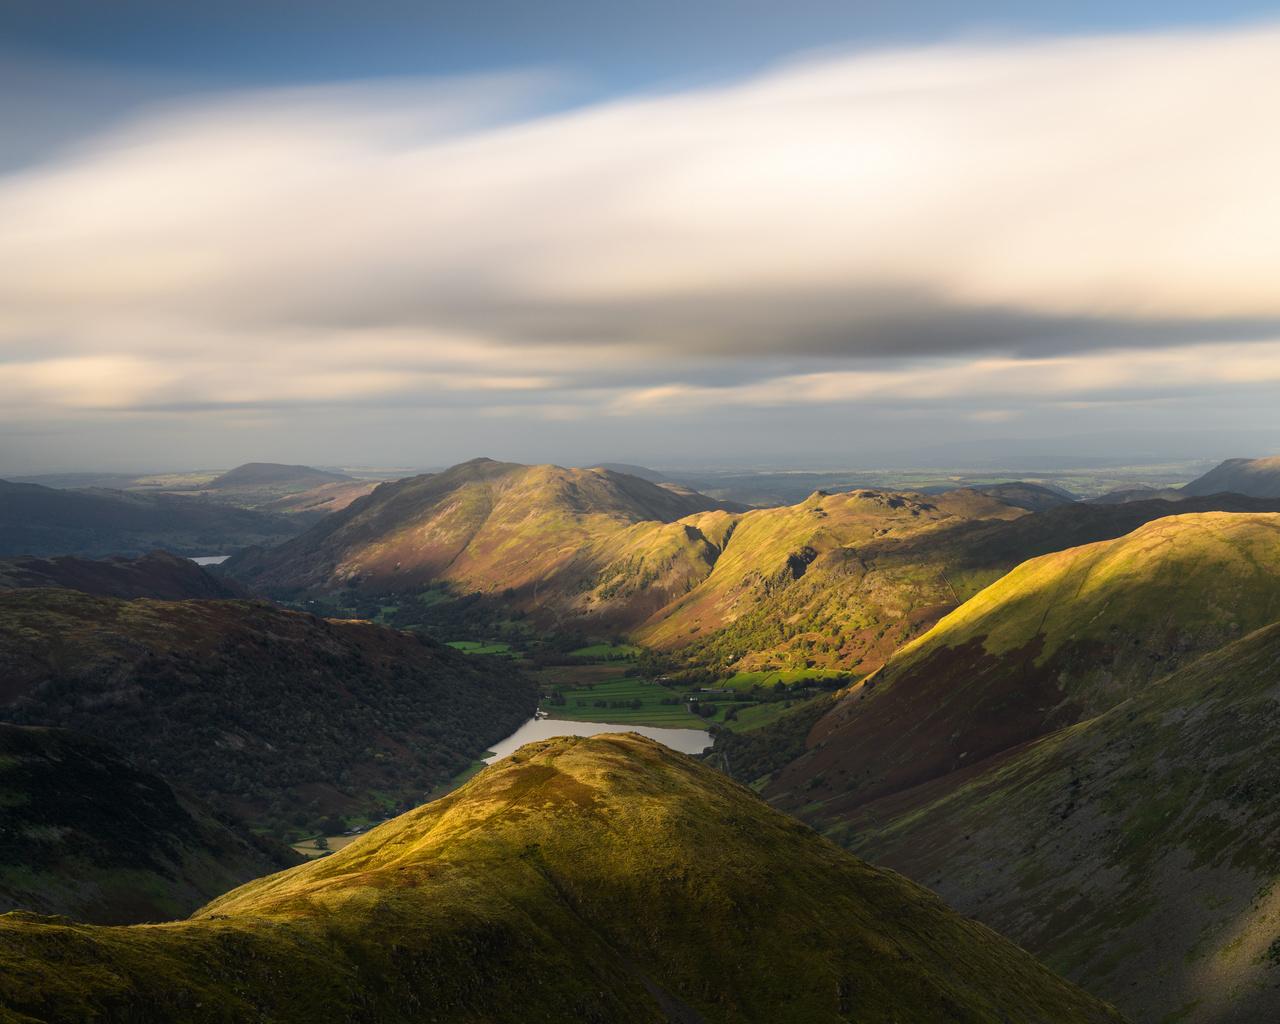 англия, озеро, lake brotherswater, lake district, cumbria, холмы, облака, долина, сверху, природа